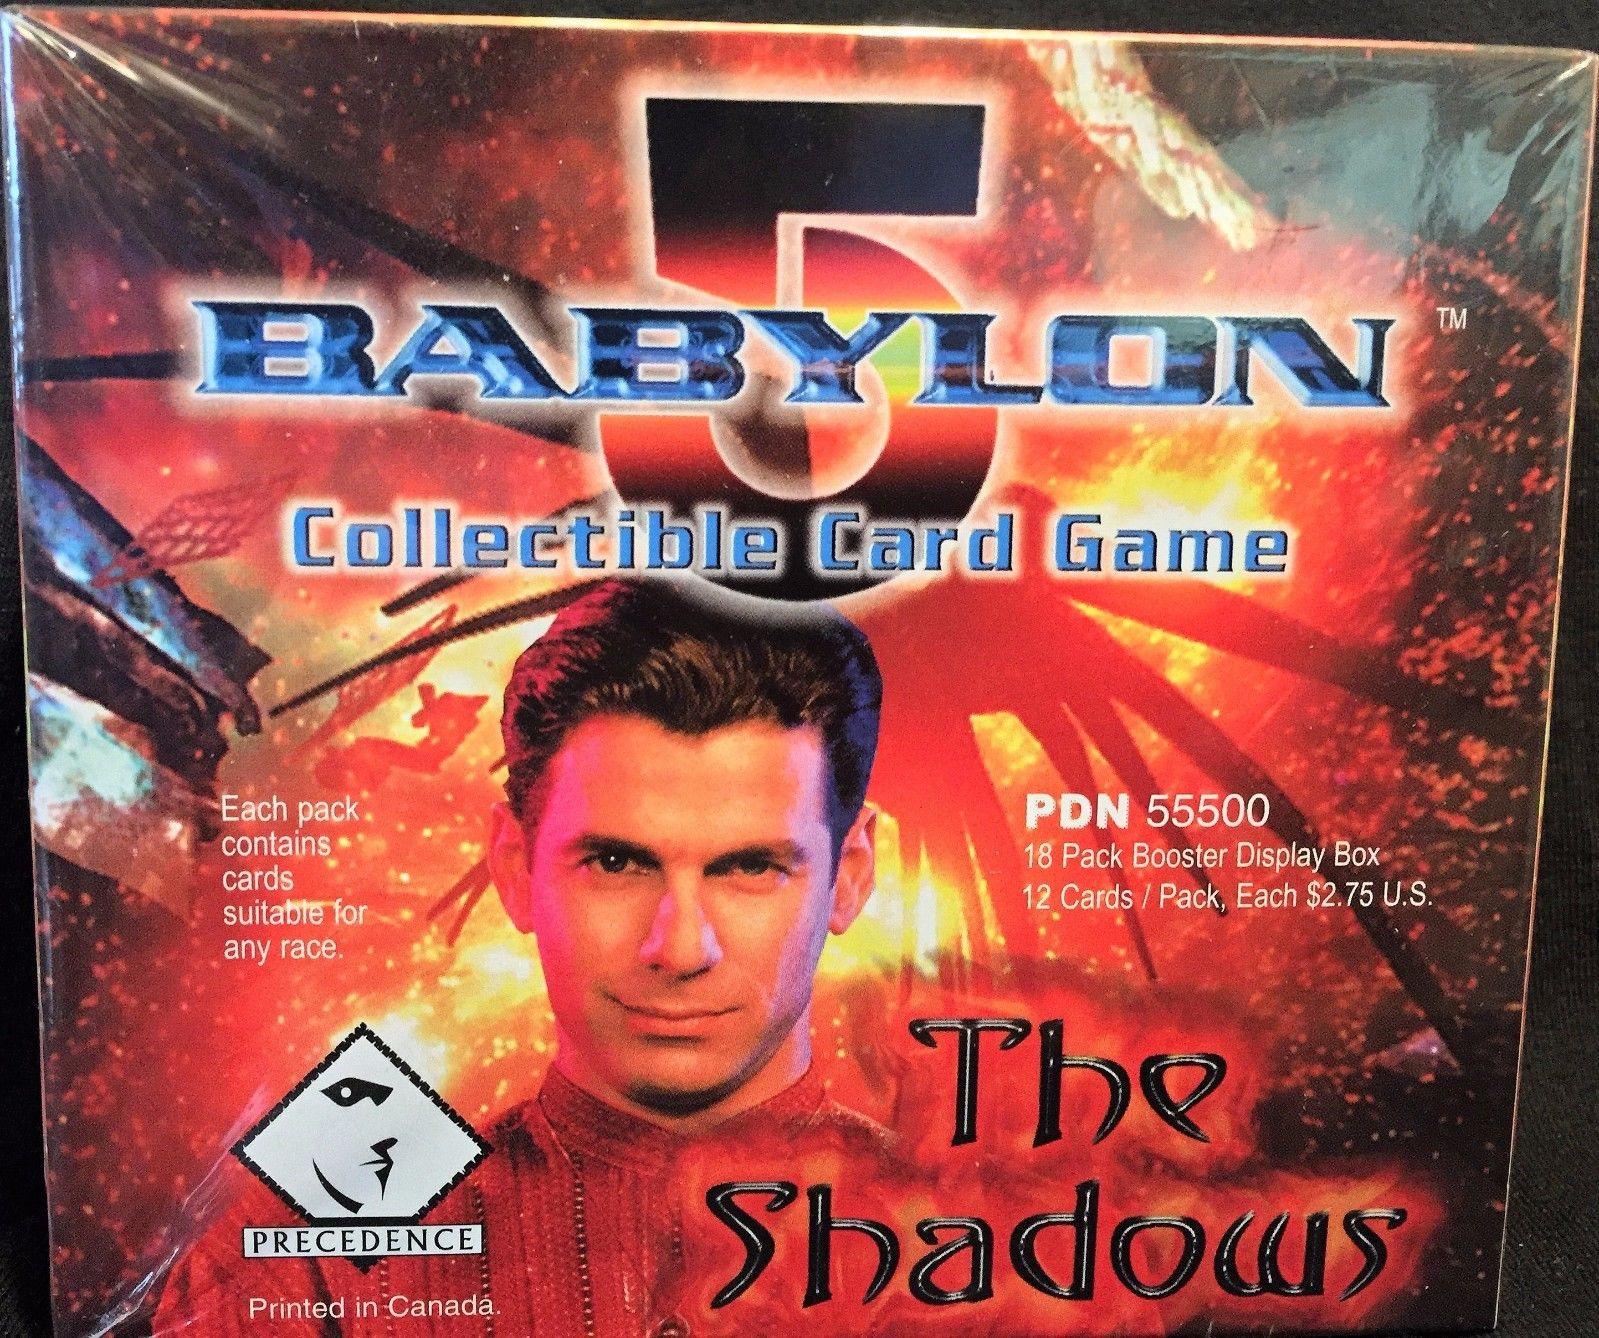 The Shadows Booster Box